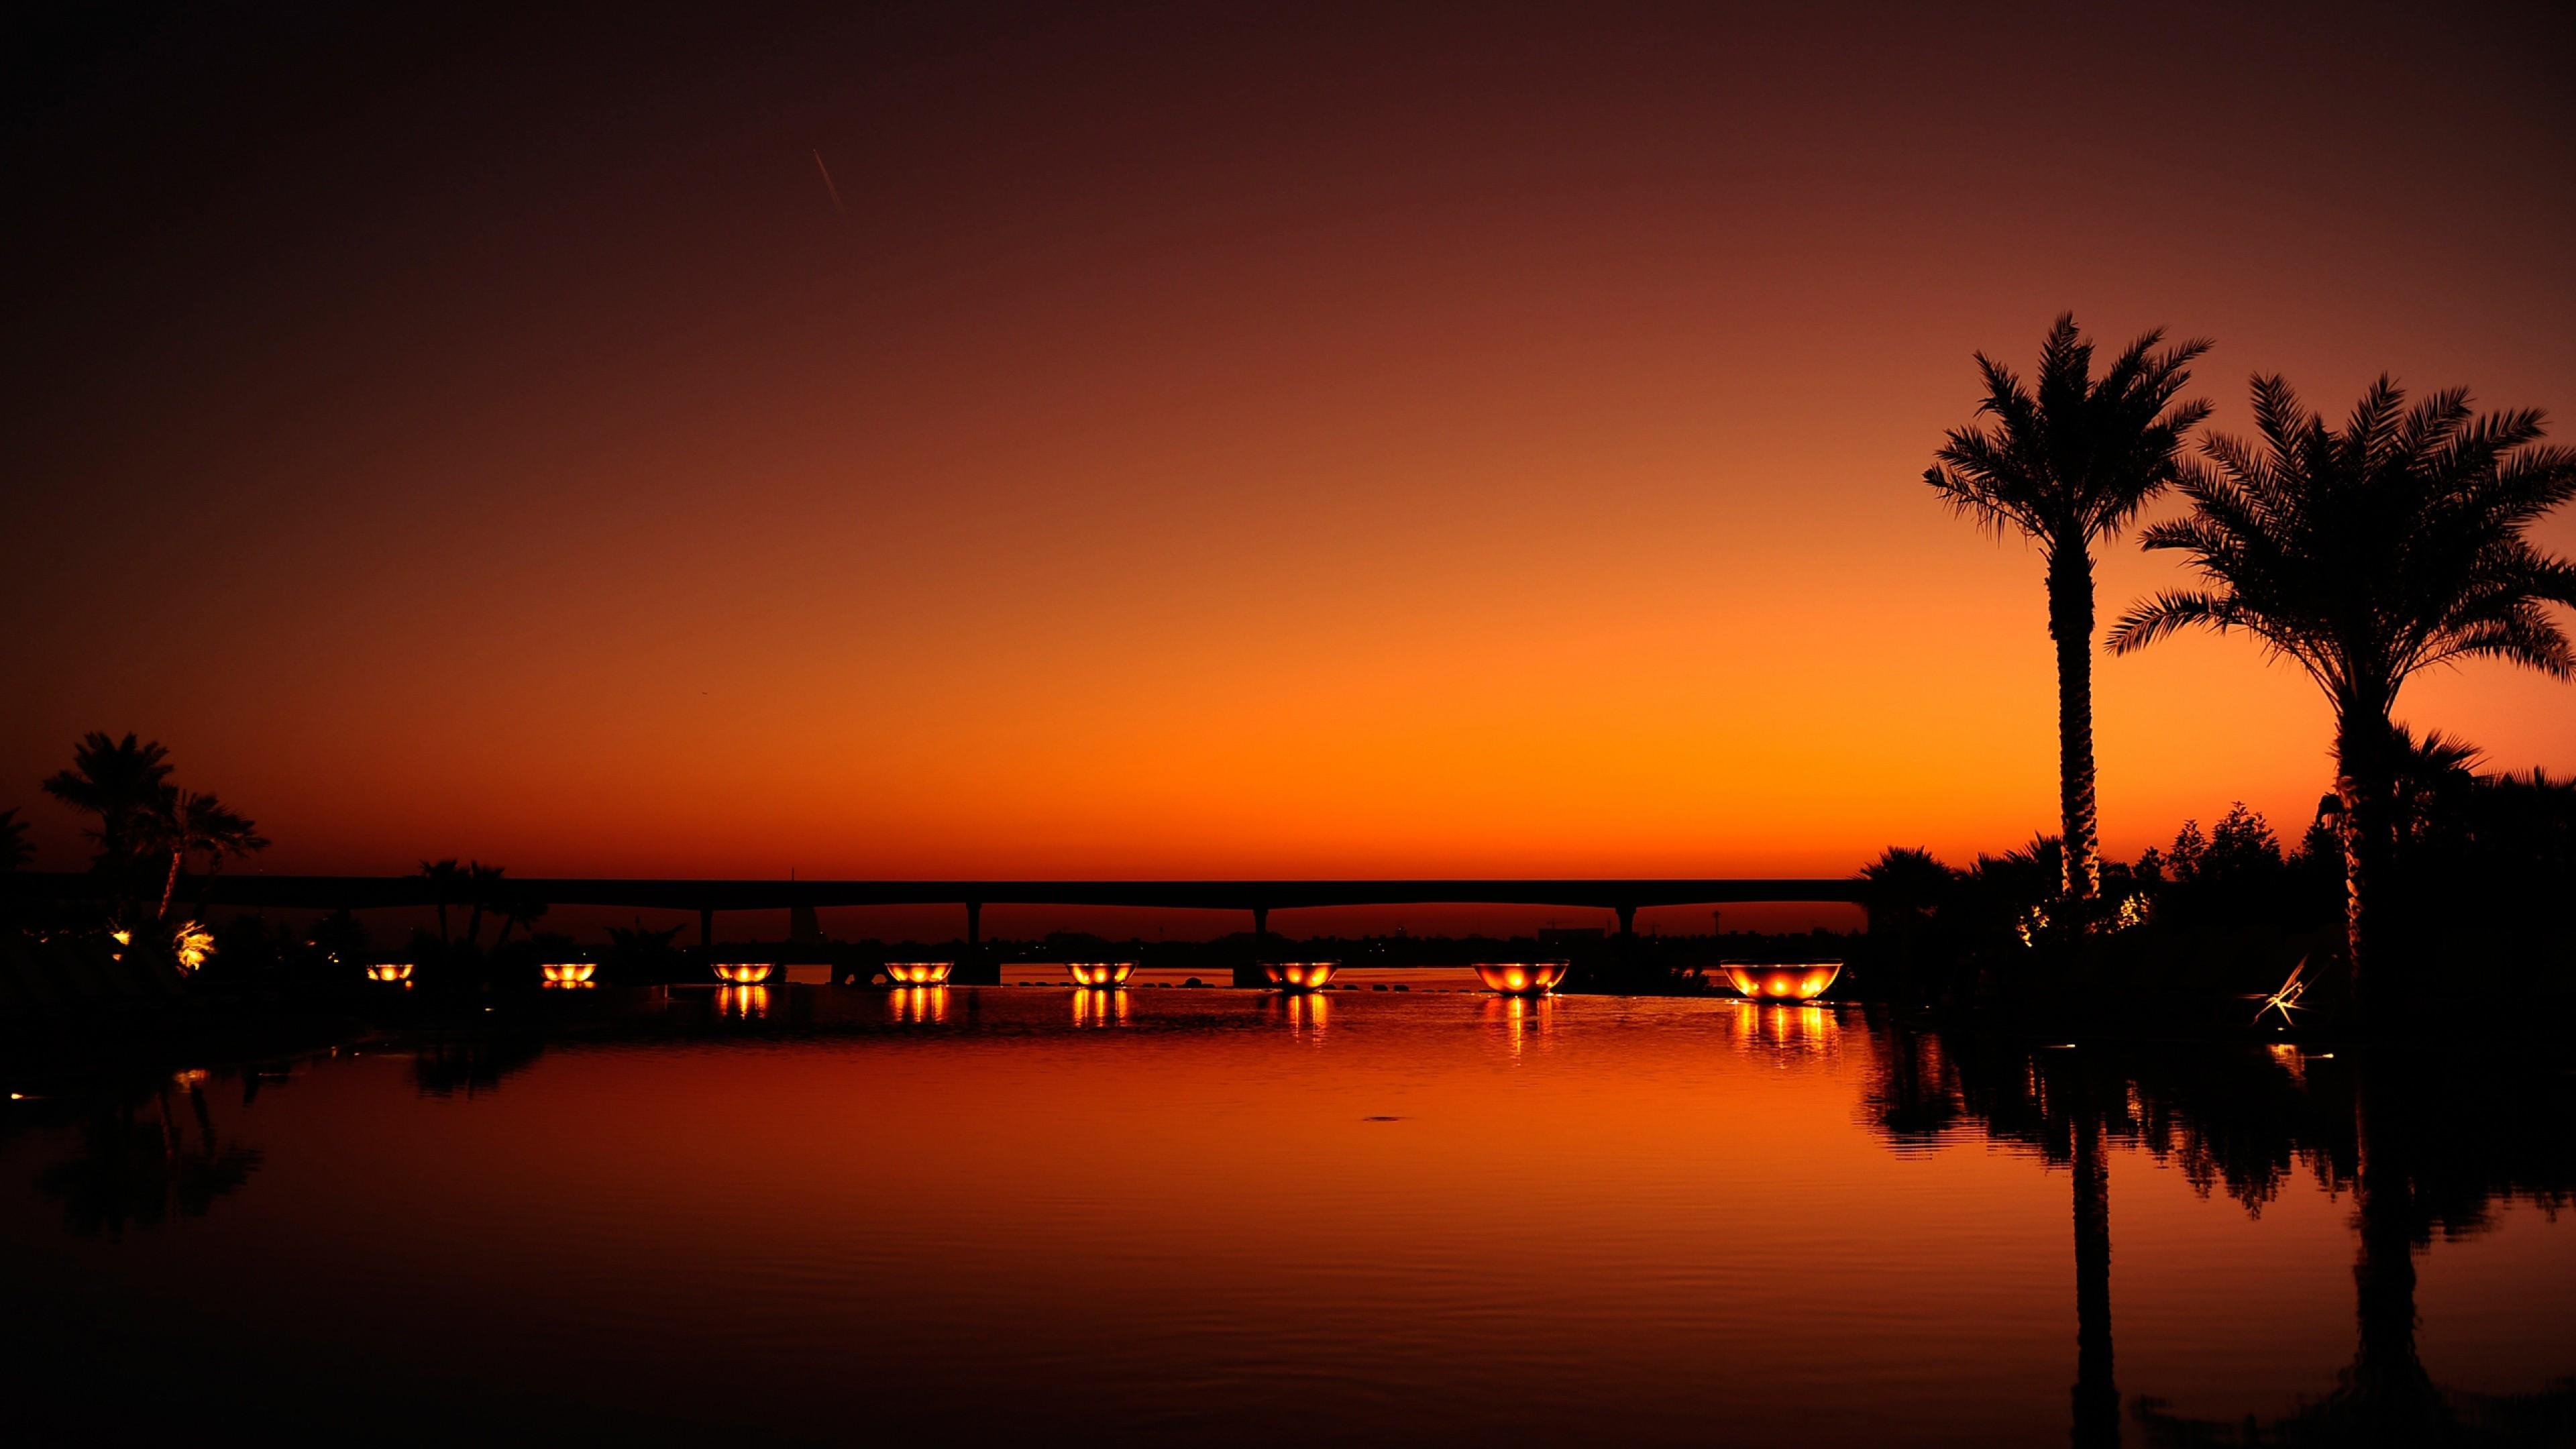 Preview wallpaper dubai, night, evening, sunset, orange, black, palm trees